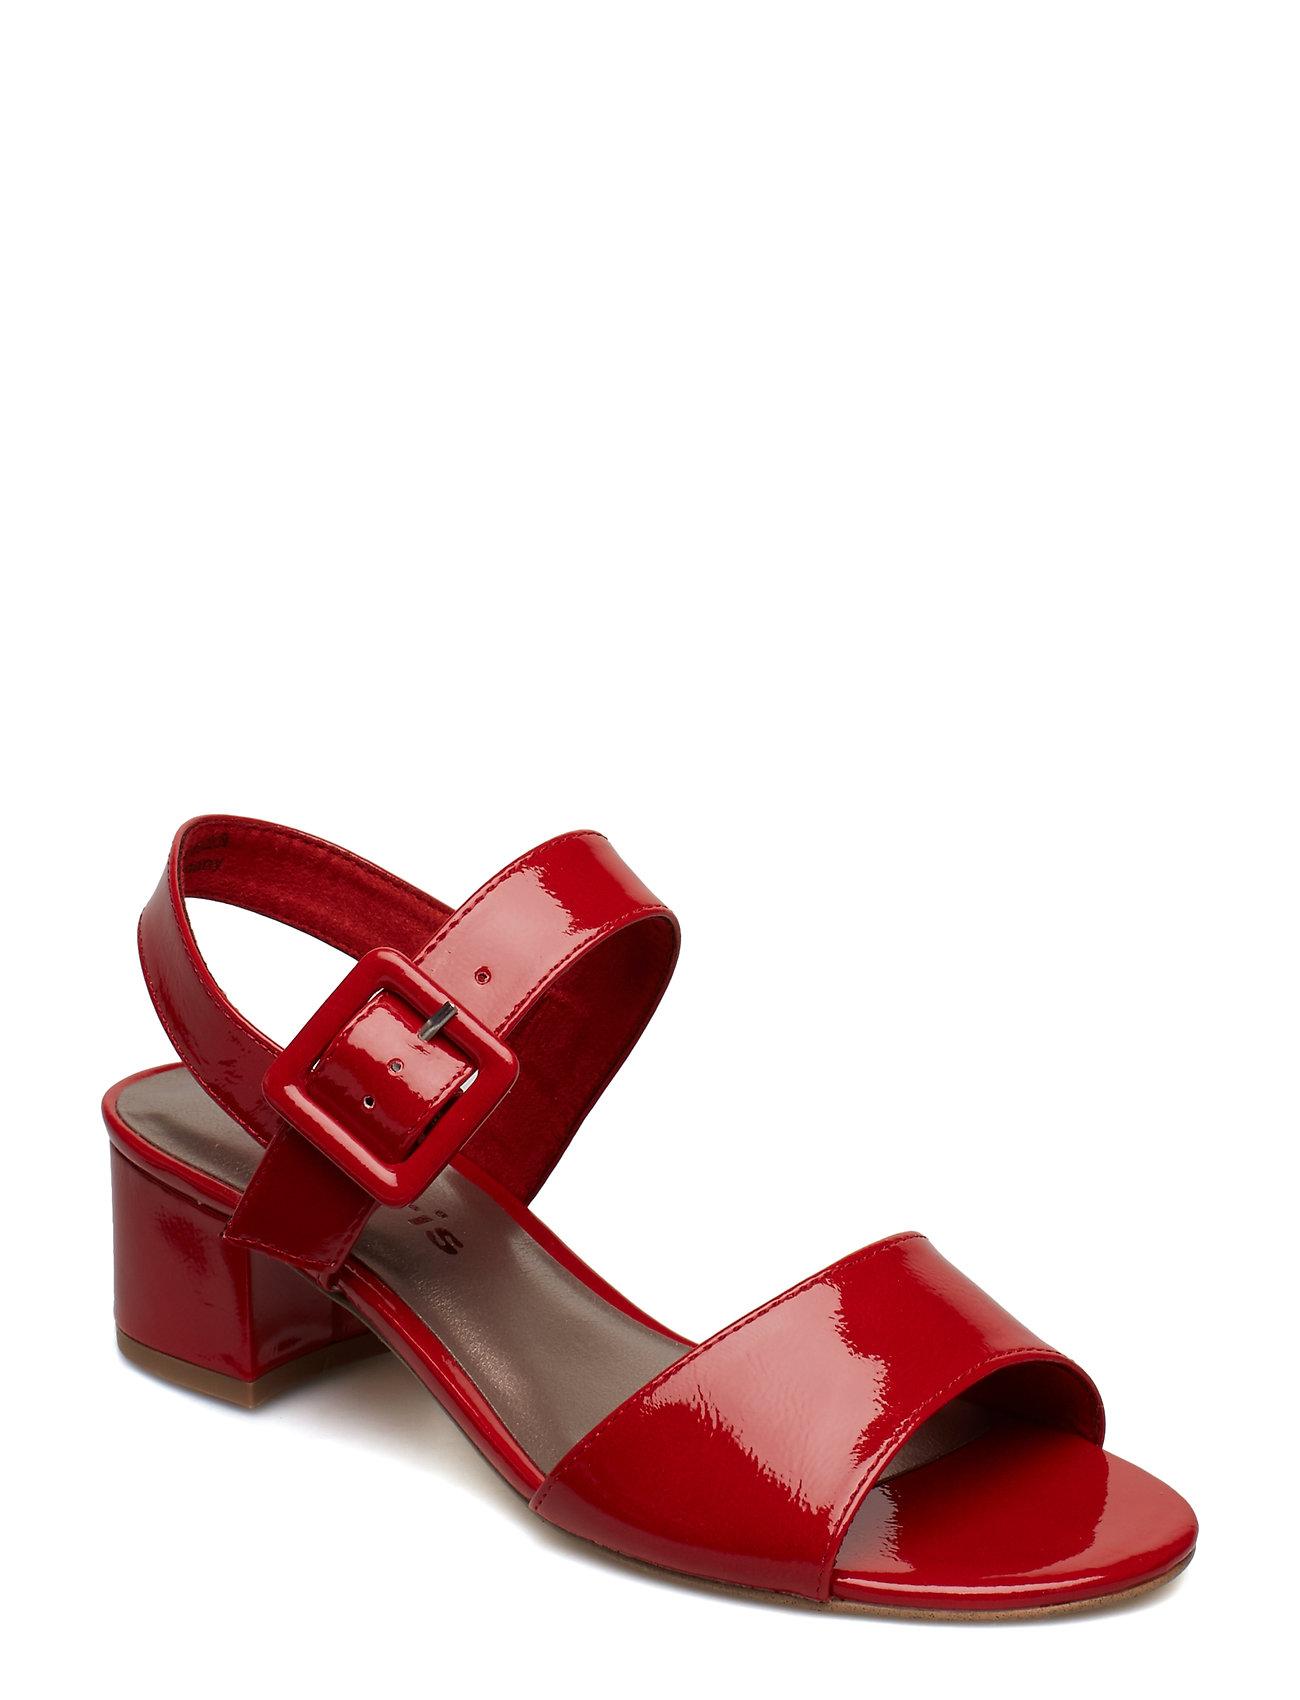 36cba0e3271b CHILI PATENT Tamaris Woms Sandals højhælede sandaler for dame ...